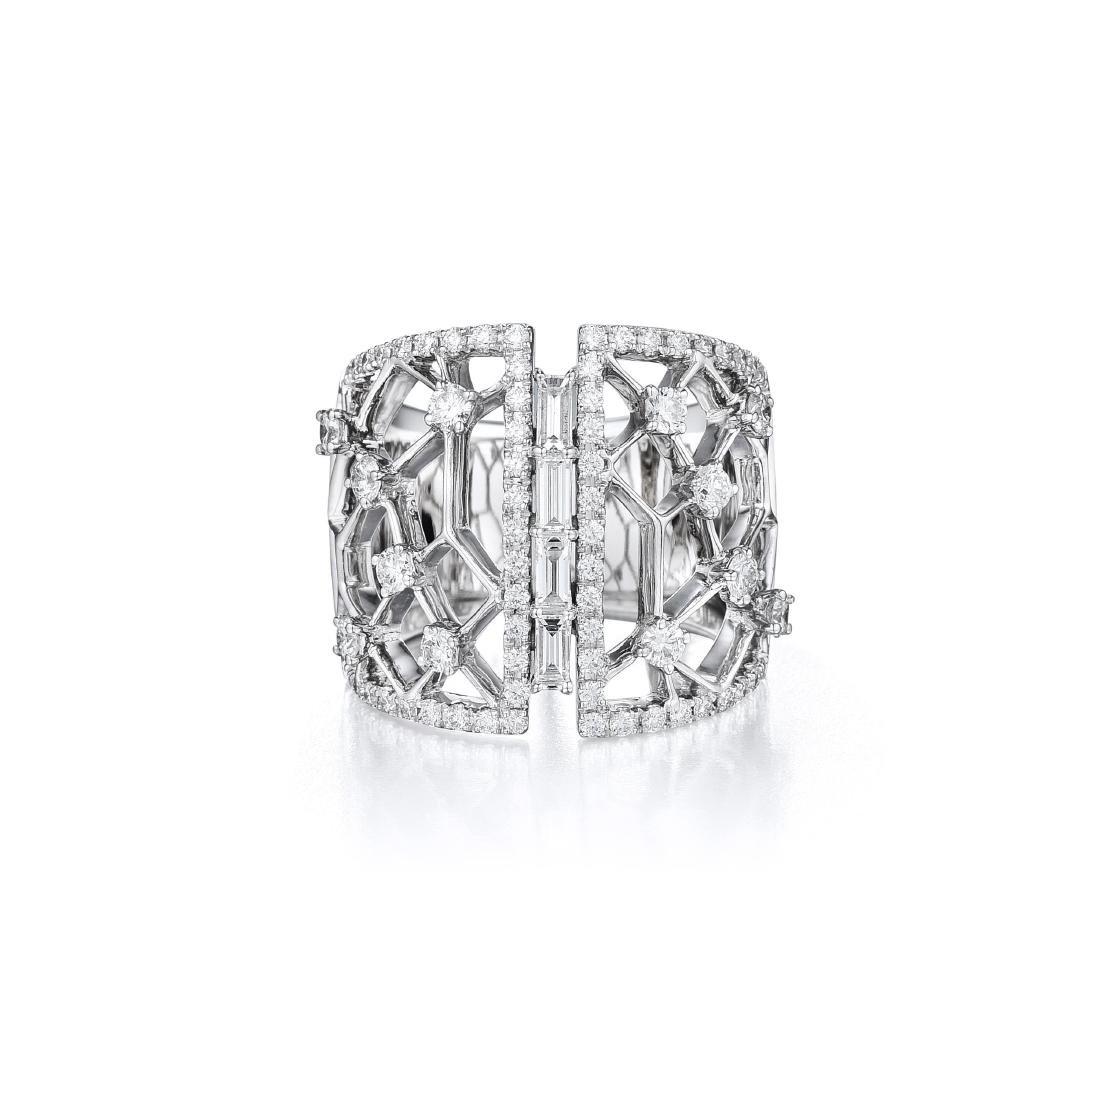 An 18k Gold Diamond Ring